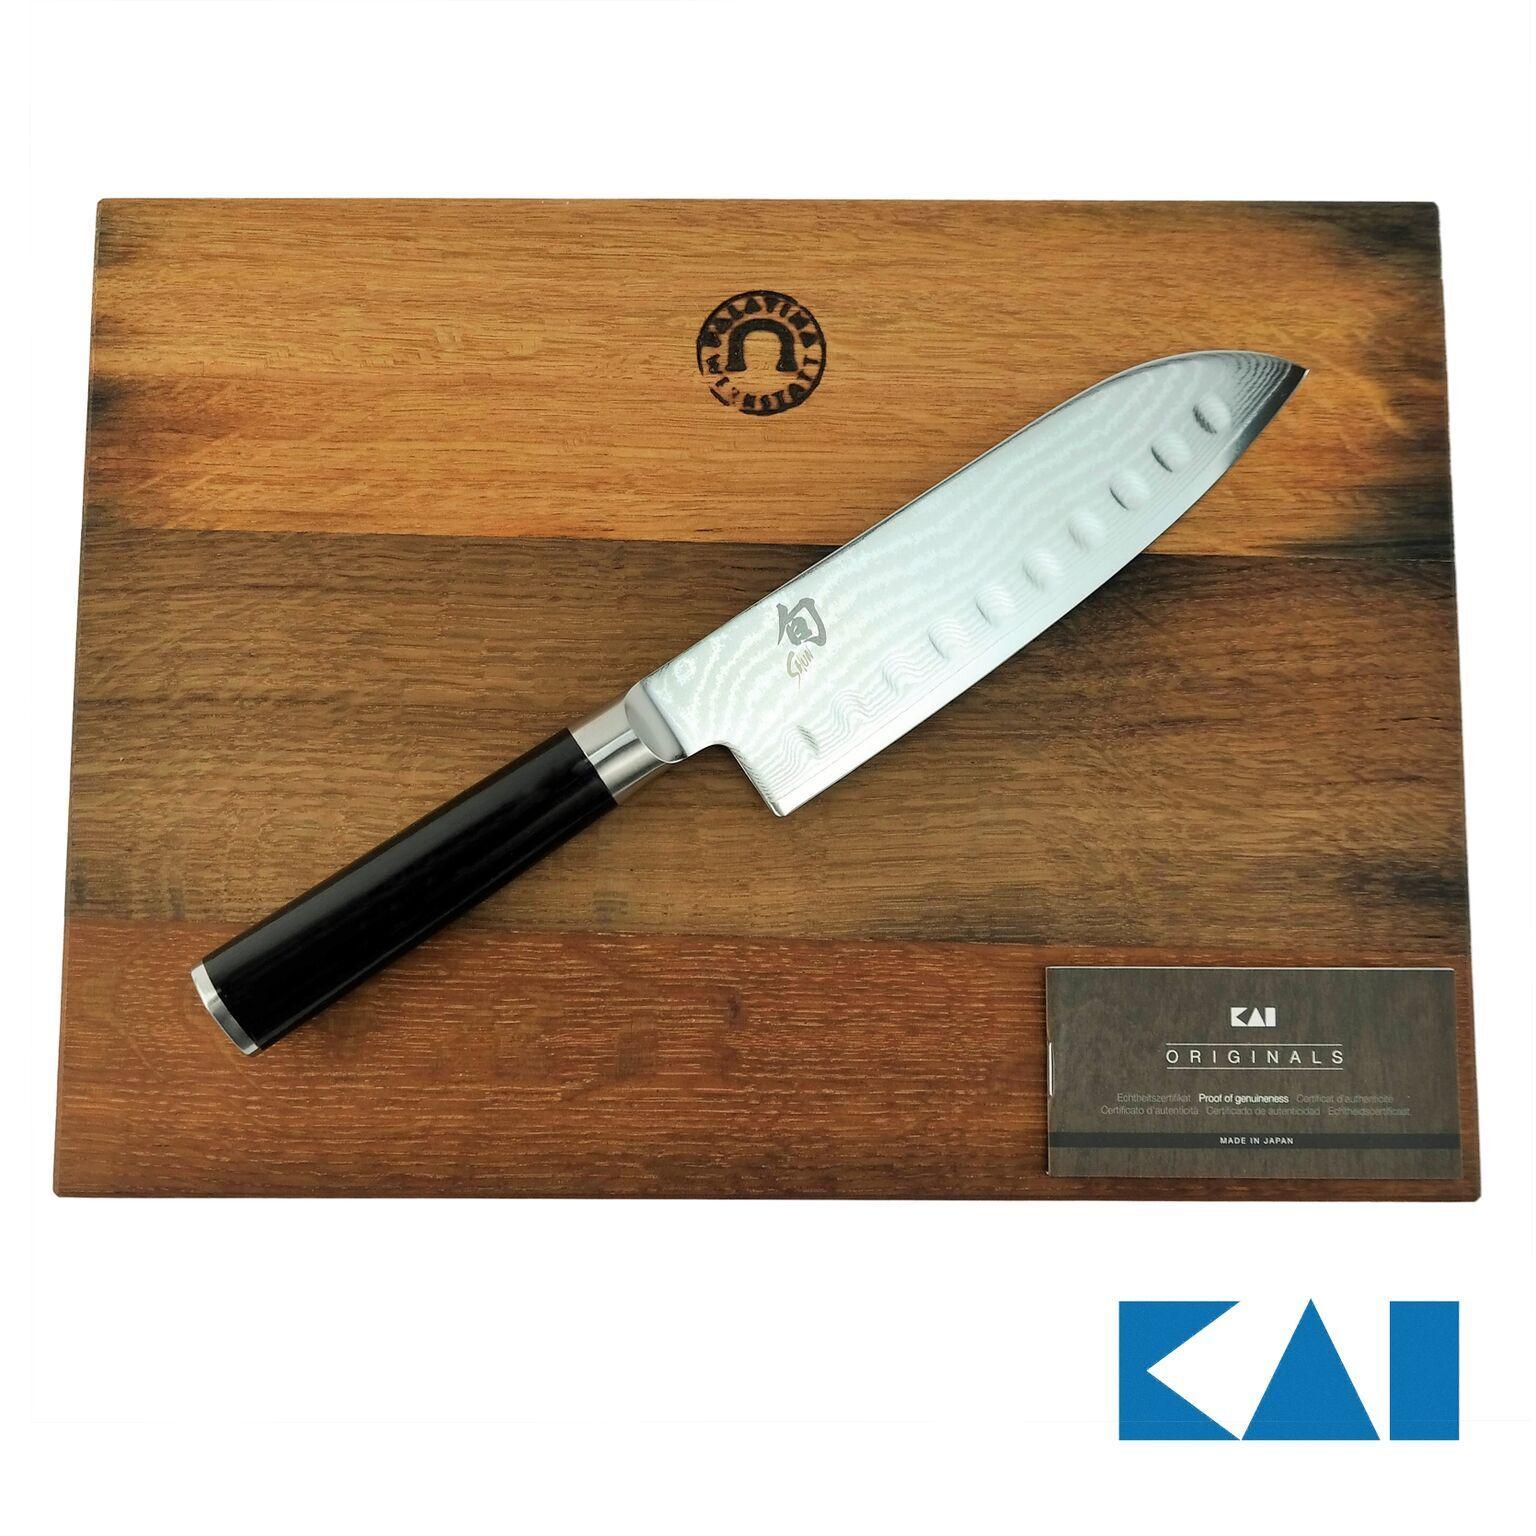 KAI Shun Classic Santoku DM-0718 mit Kullenschliff,ultrascharf+ Kullenschliff,ultrascharf+ Kullenschliff,ultrascharf+ Schneidebrett 5fe846